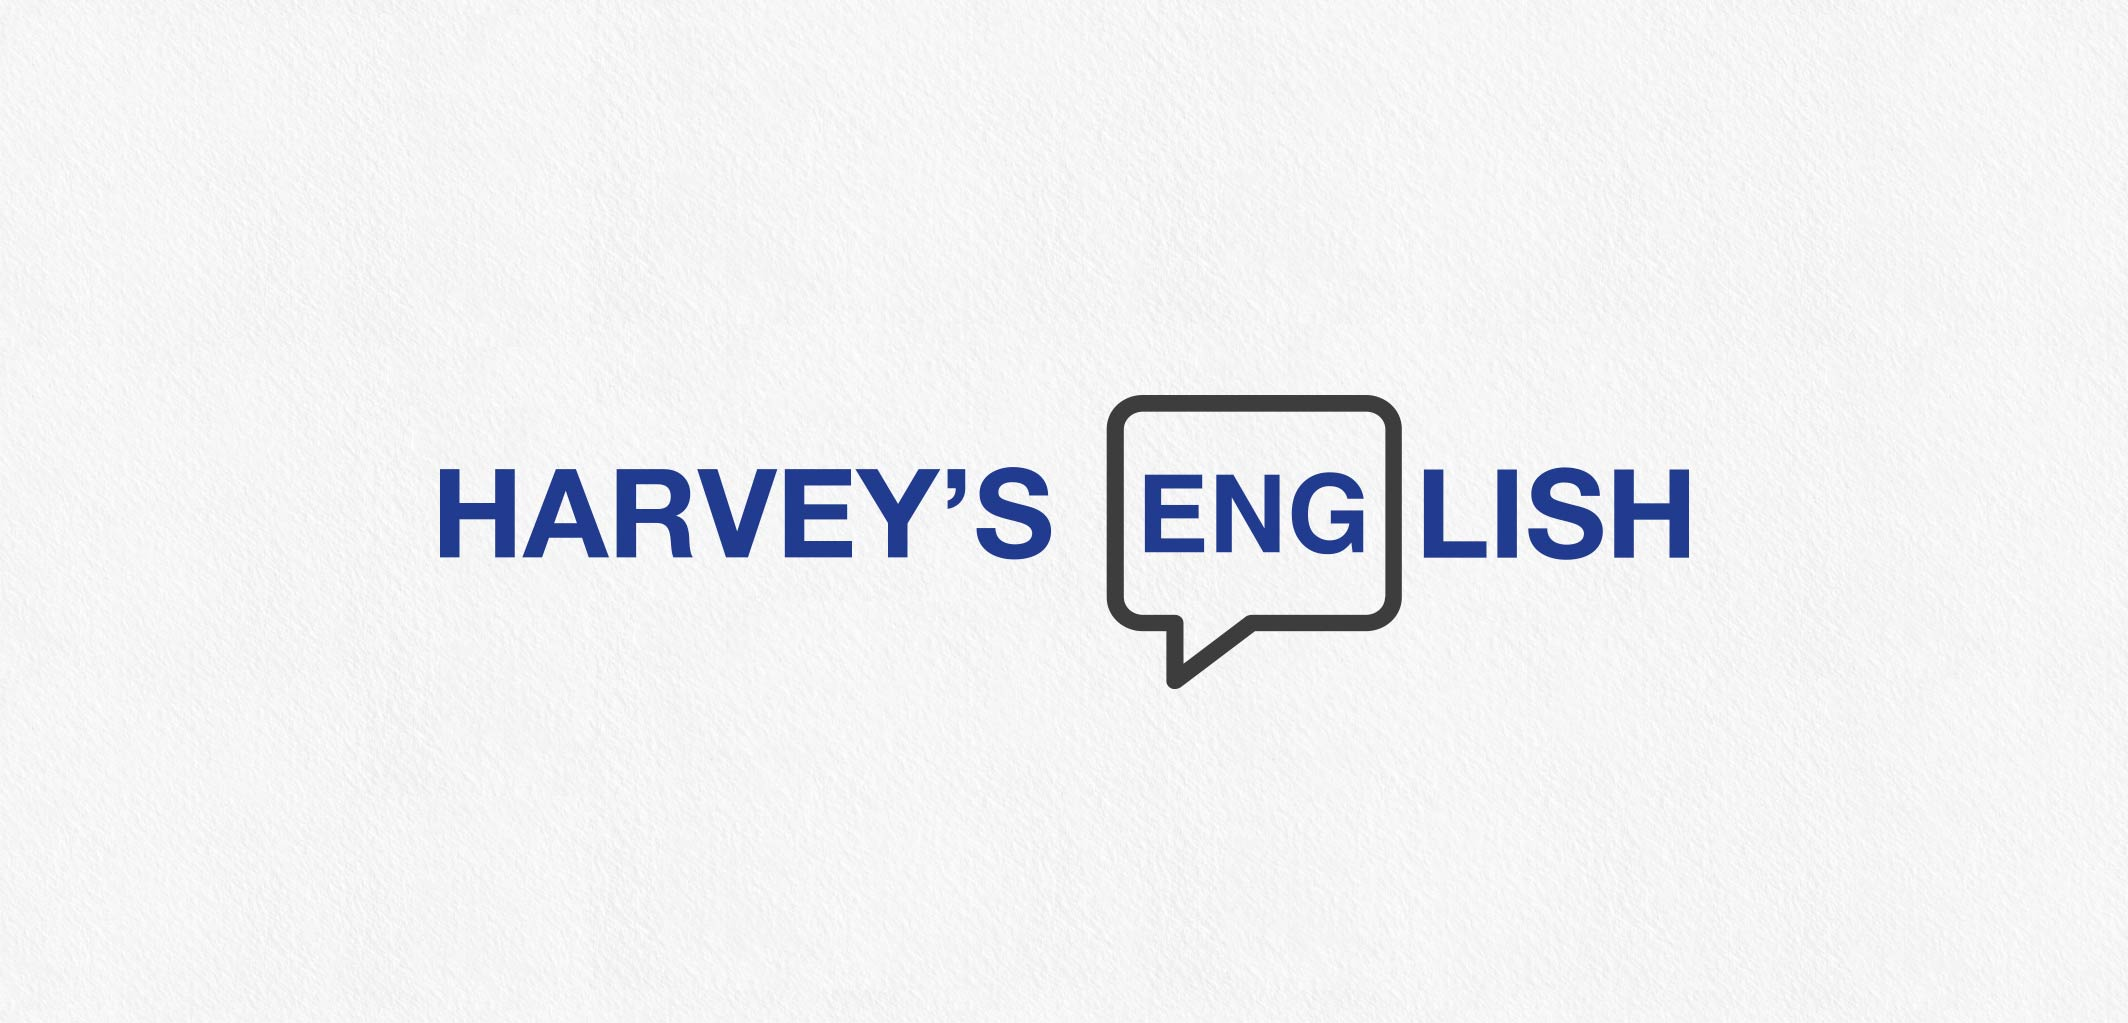 Harvey's English